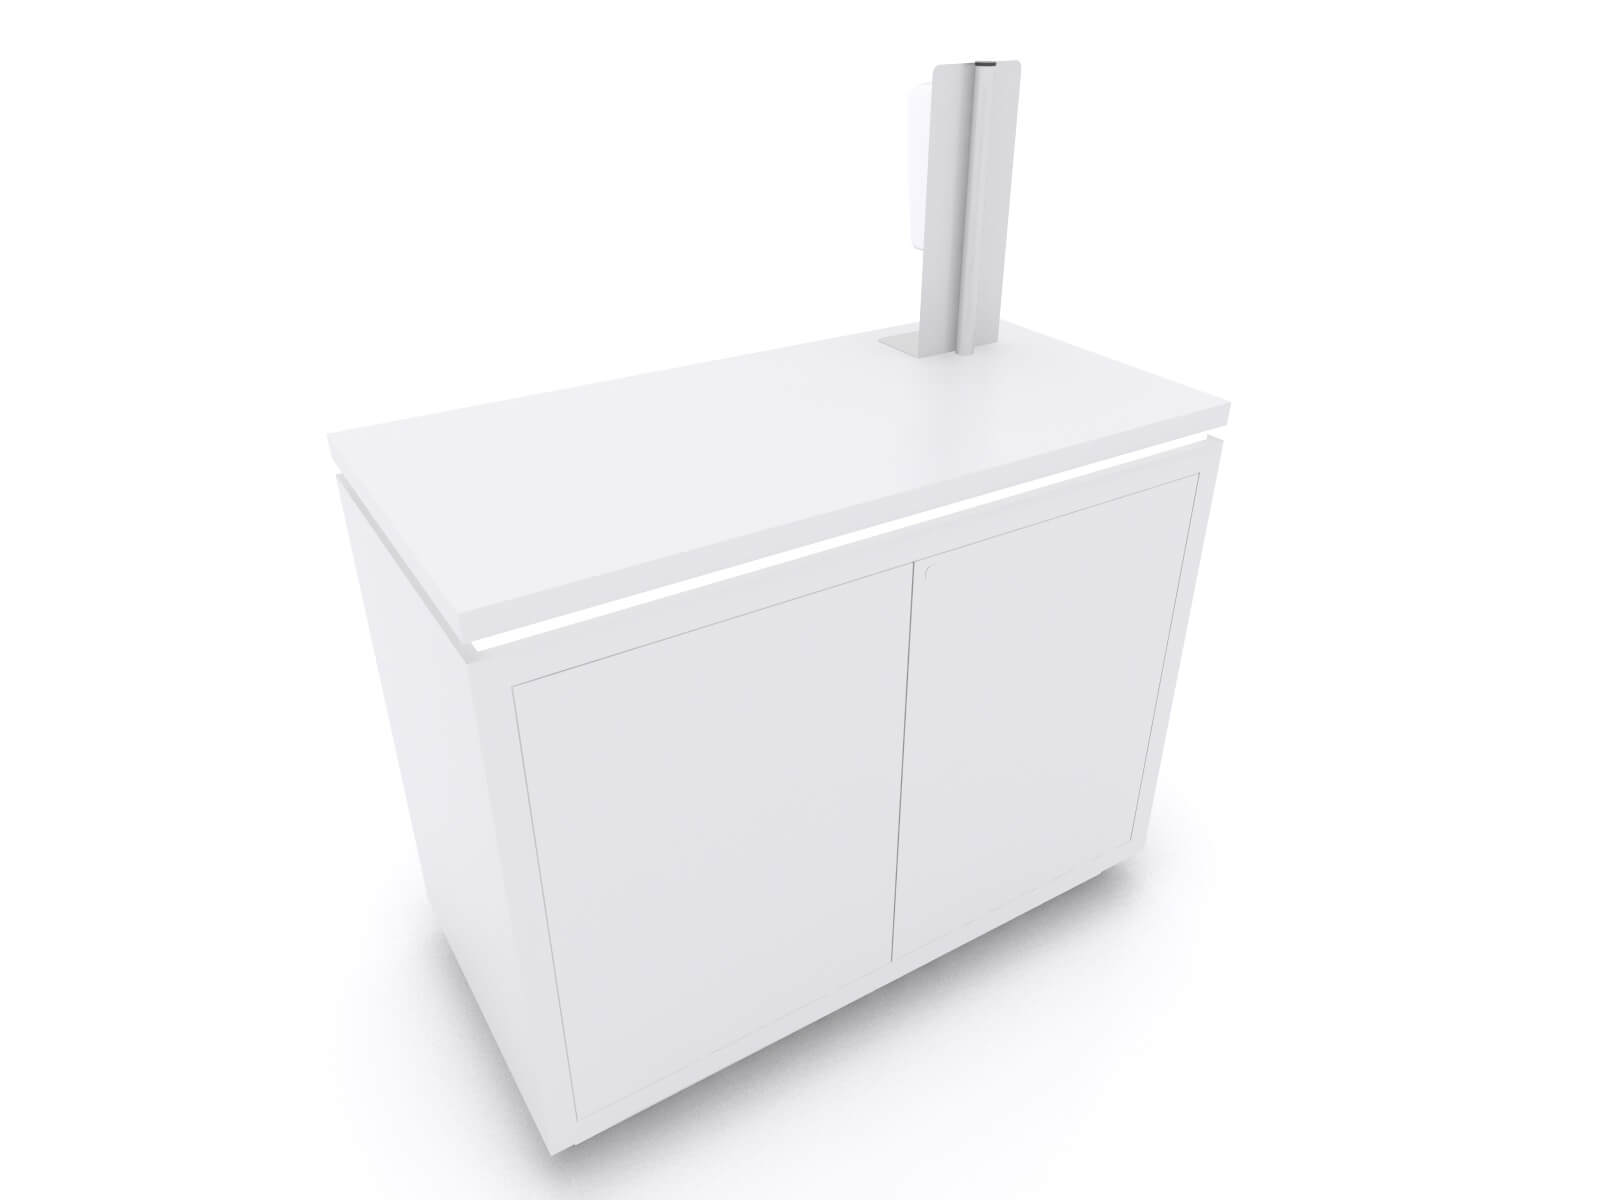 MOD-9006 Hand Sanitizer Stand - image 4